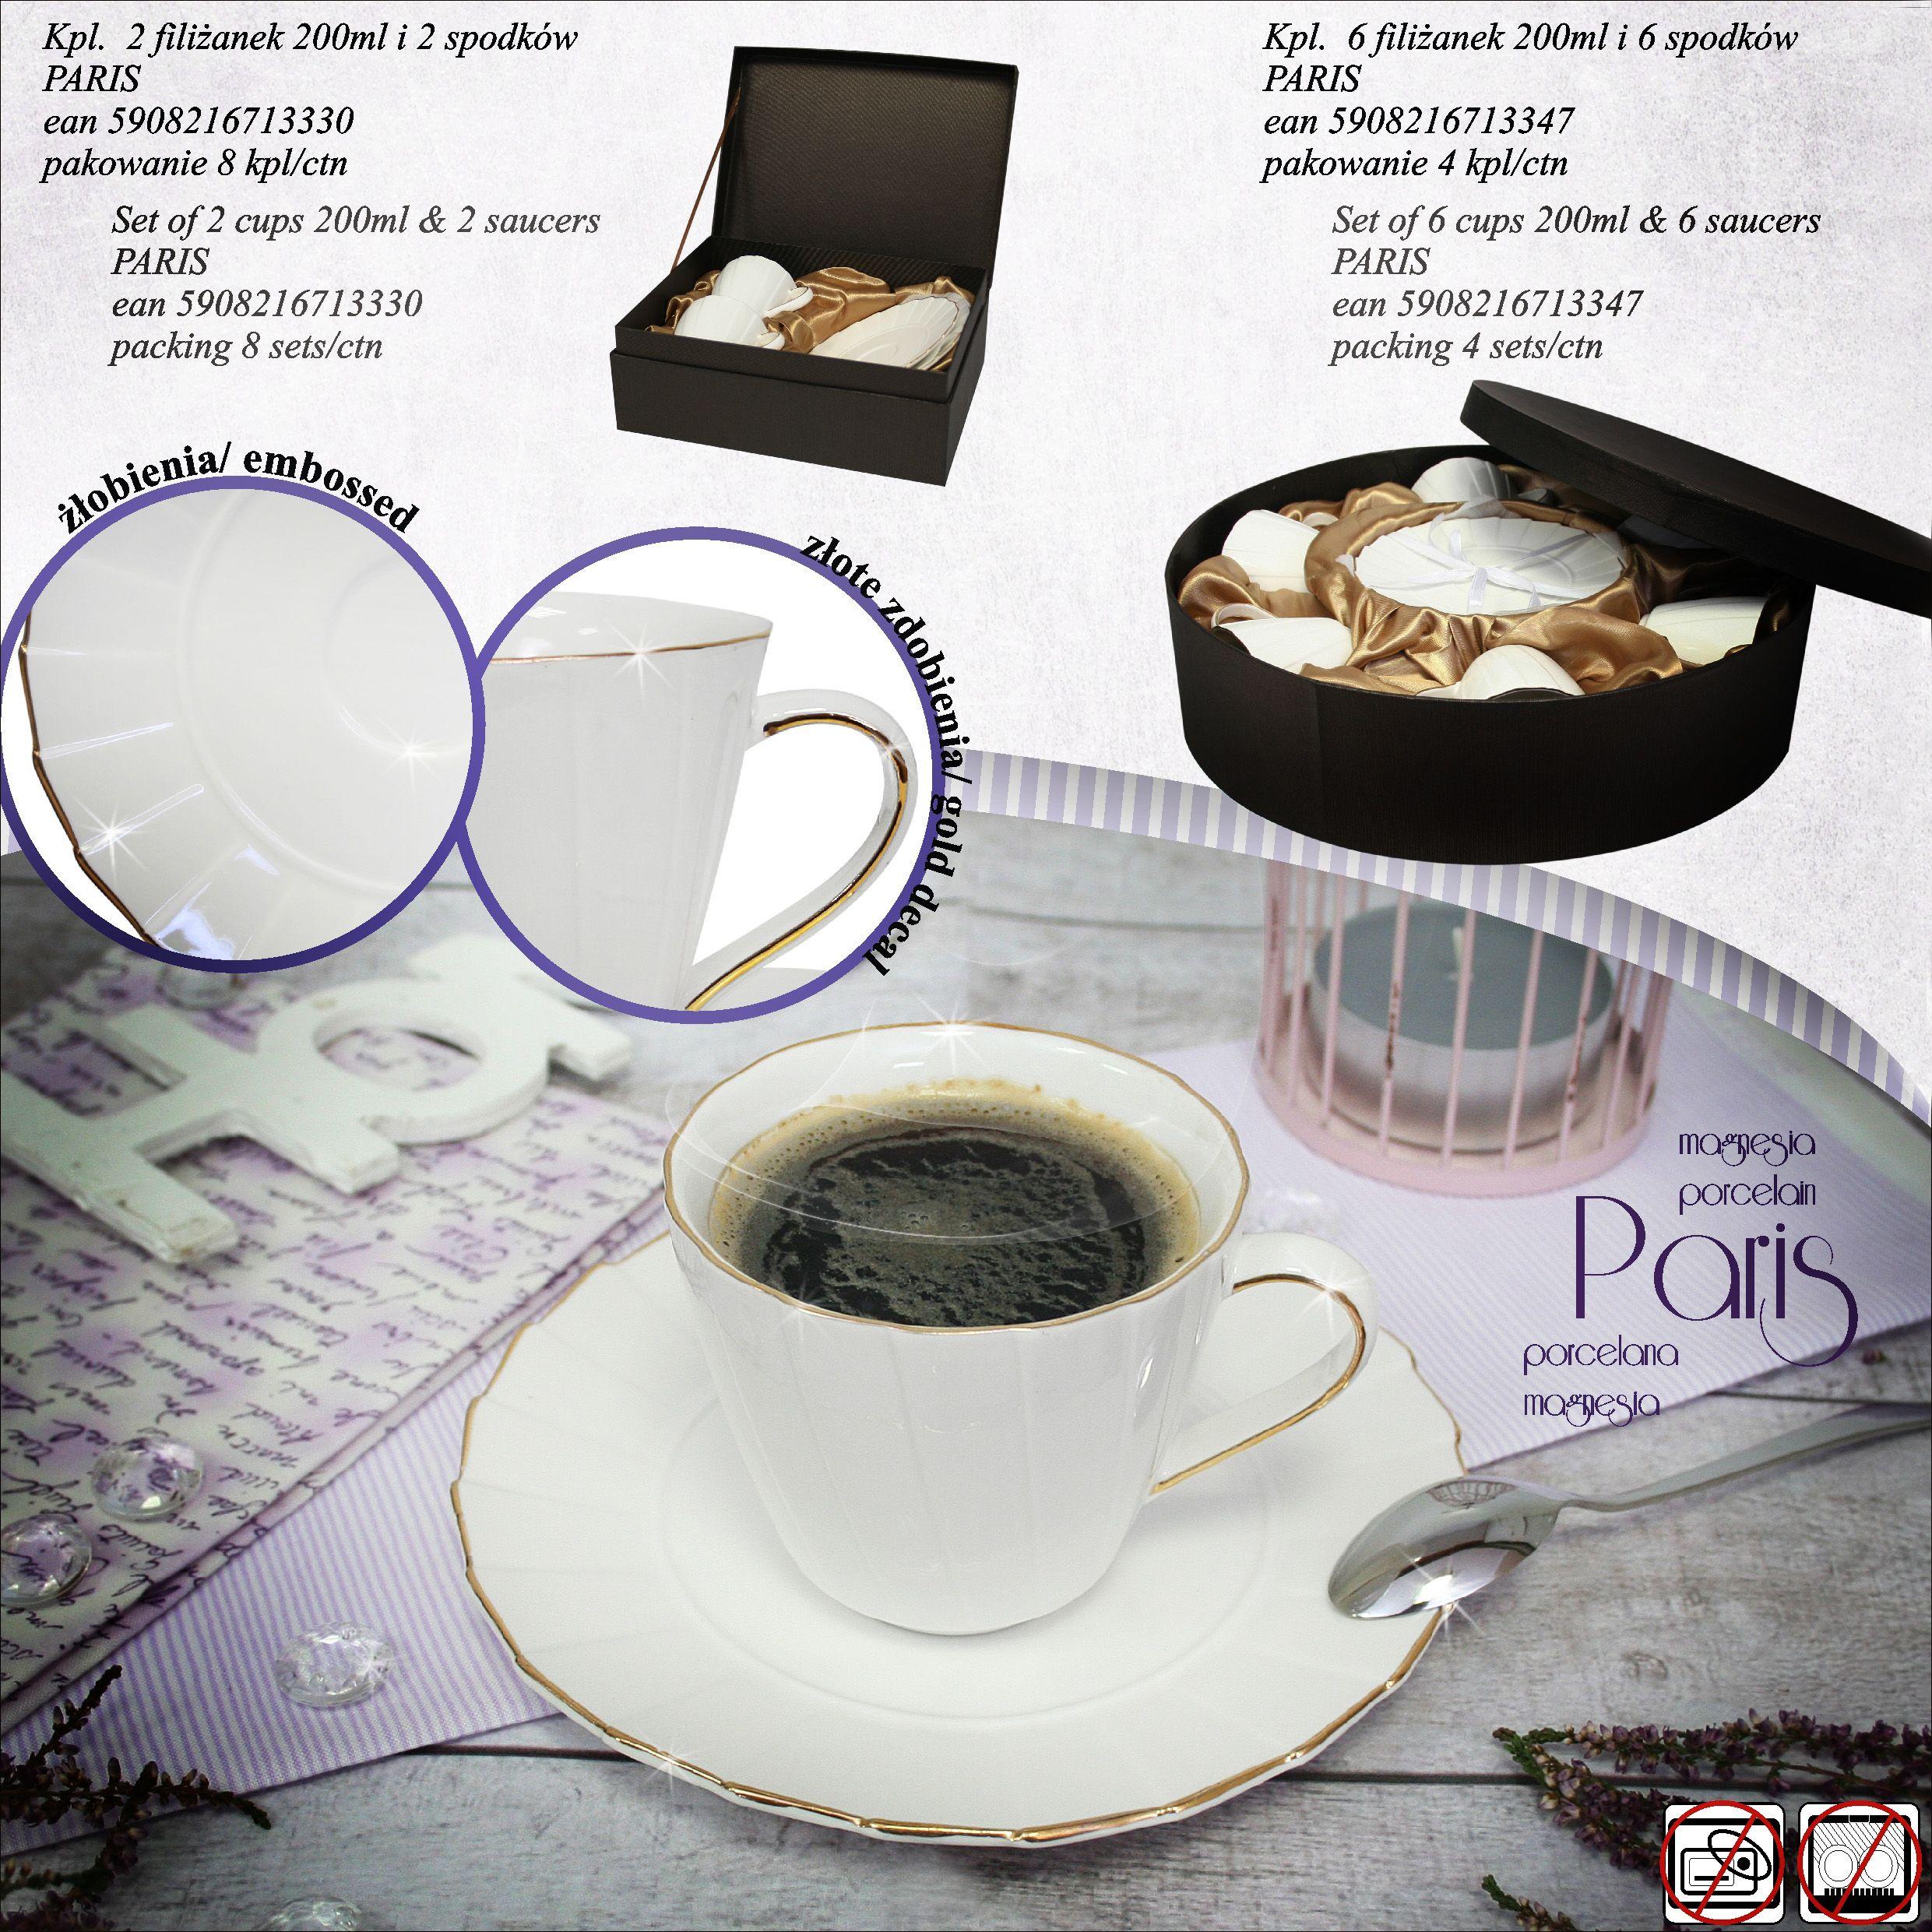 Pin By Porcelana Ceramika Veroni On Filianki Zestawy Do Herbaty I Kopi Janda More Information